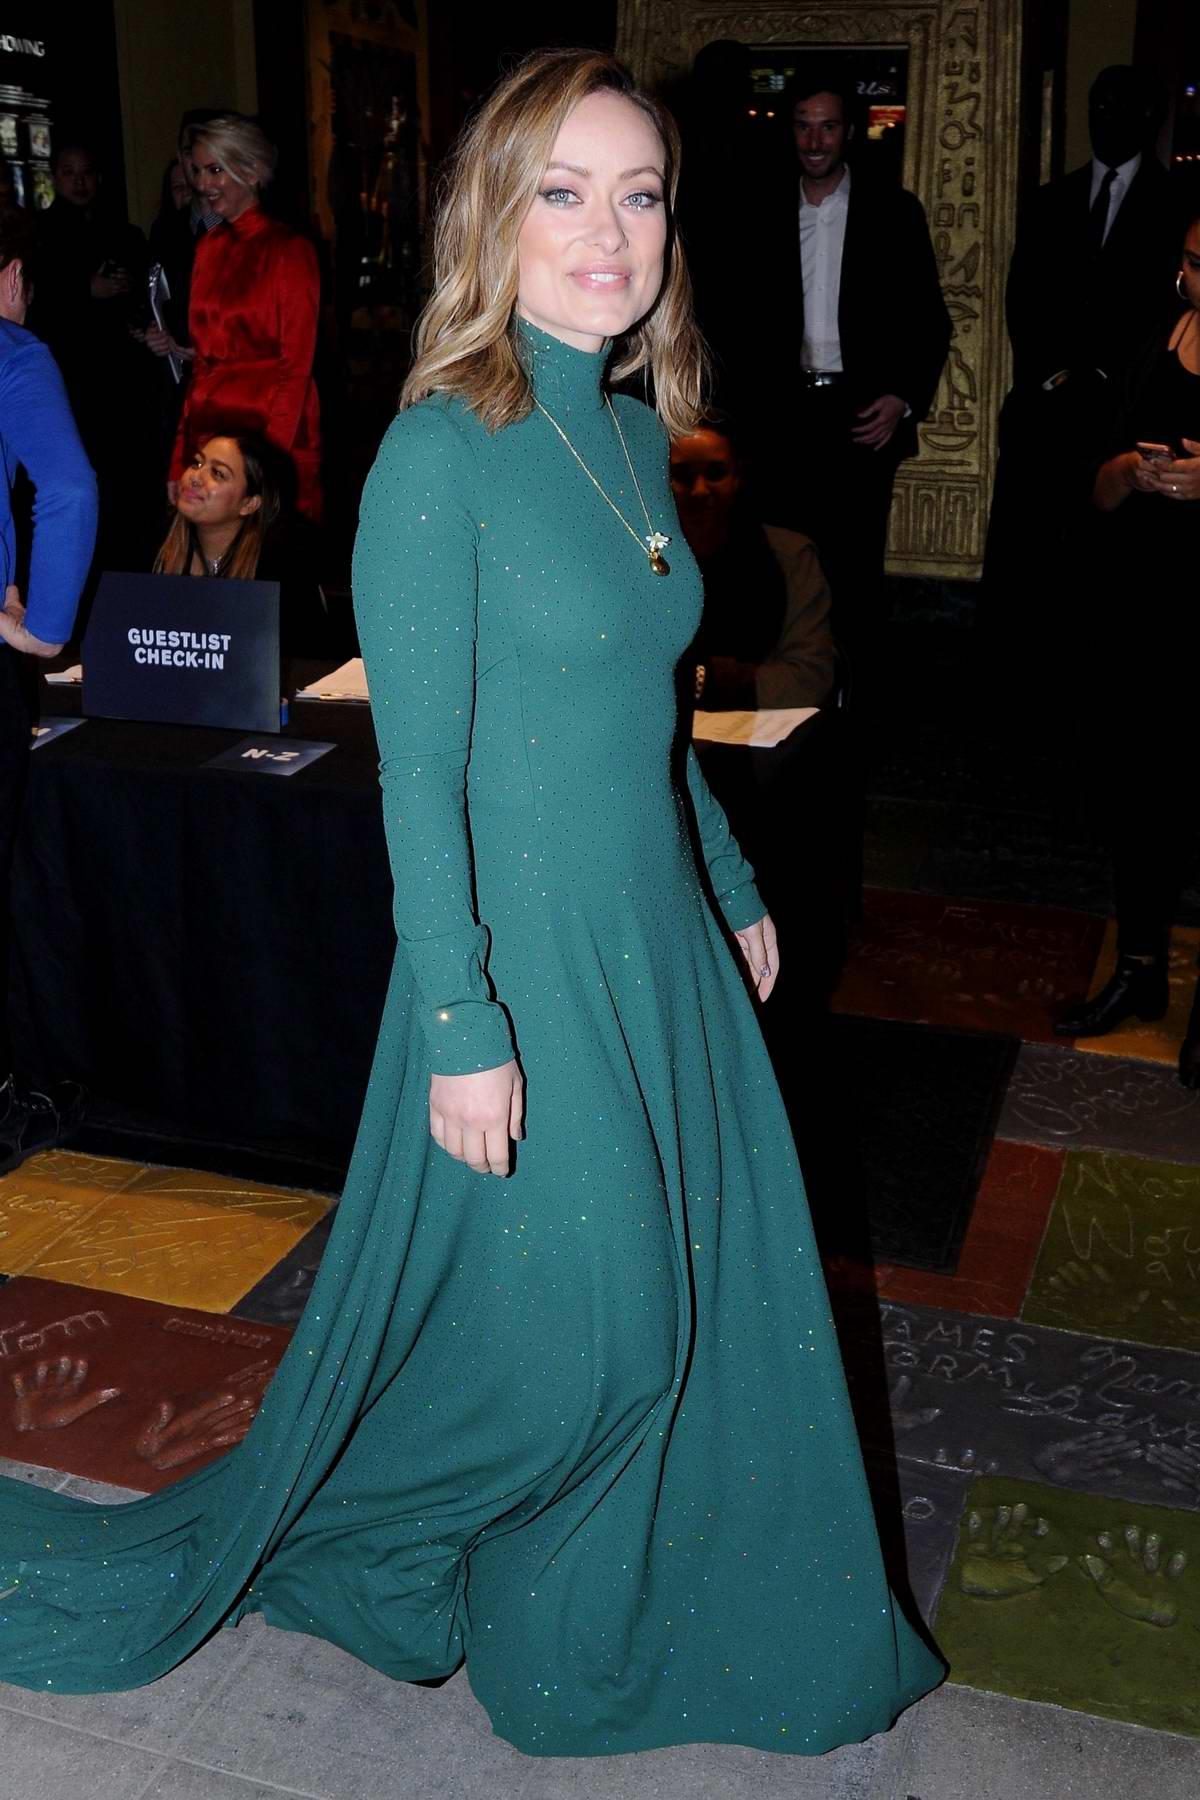 Olivia Wilde attends the Special Screening of 'A Vigilante' in Los Angeles